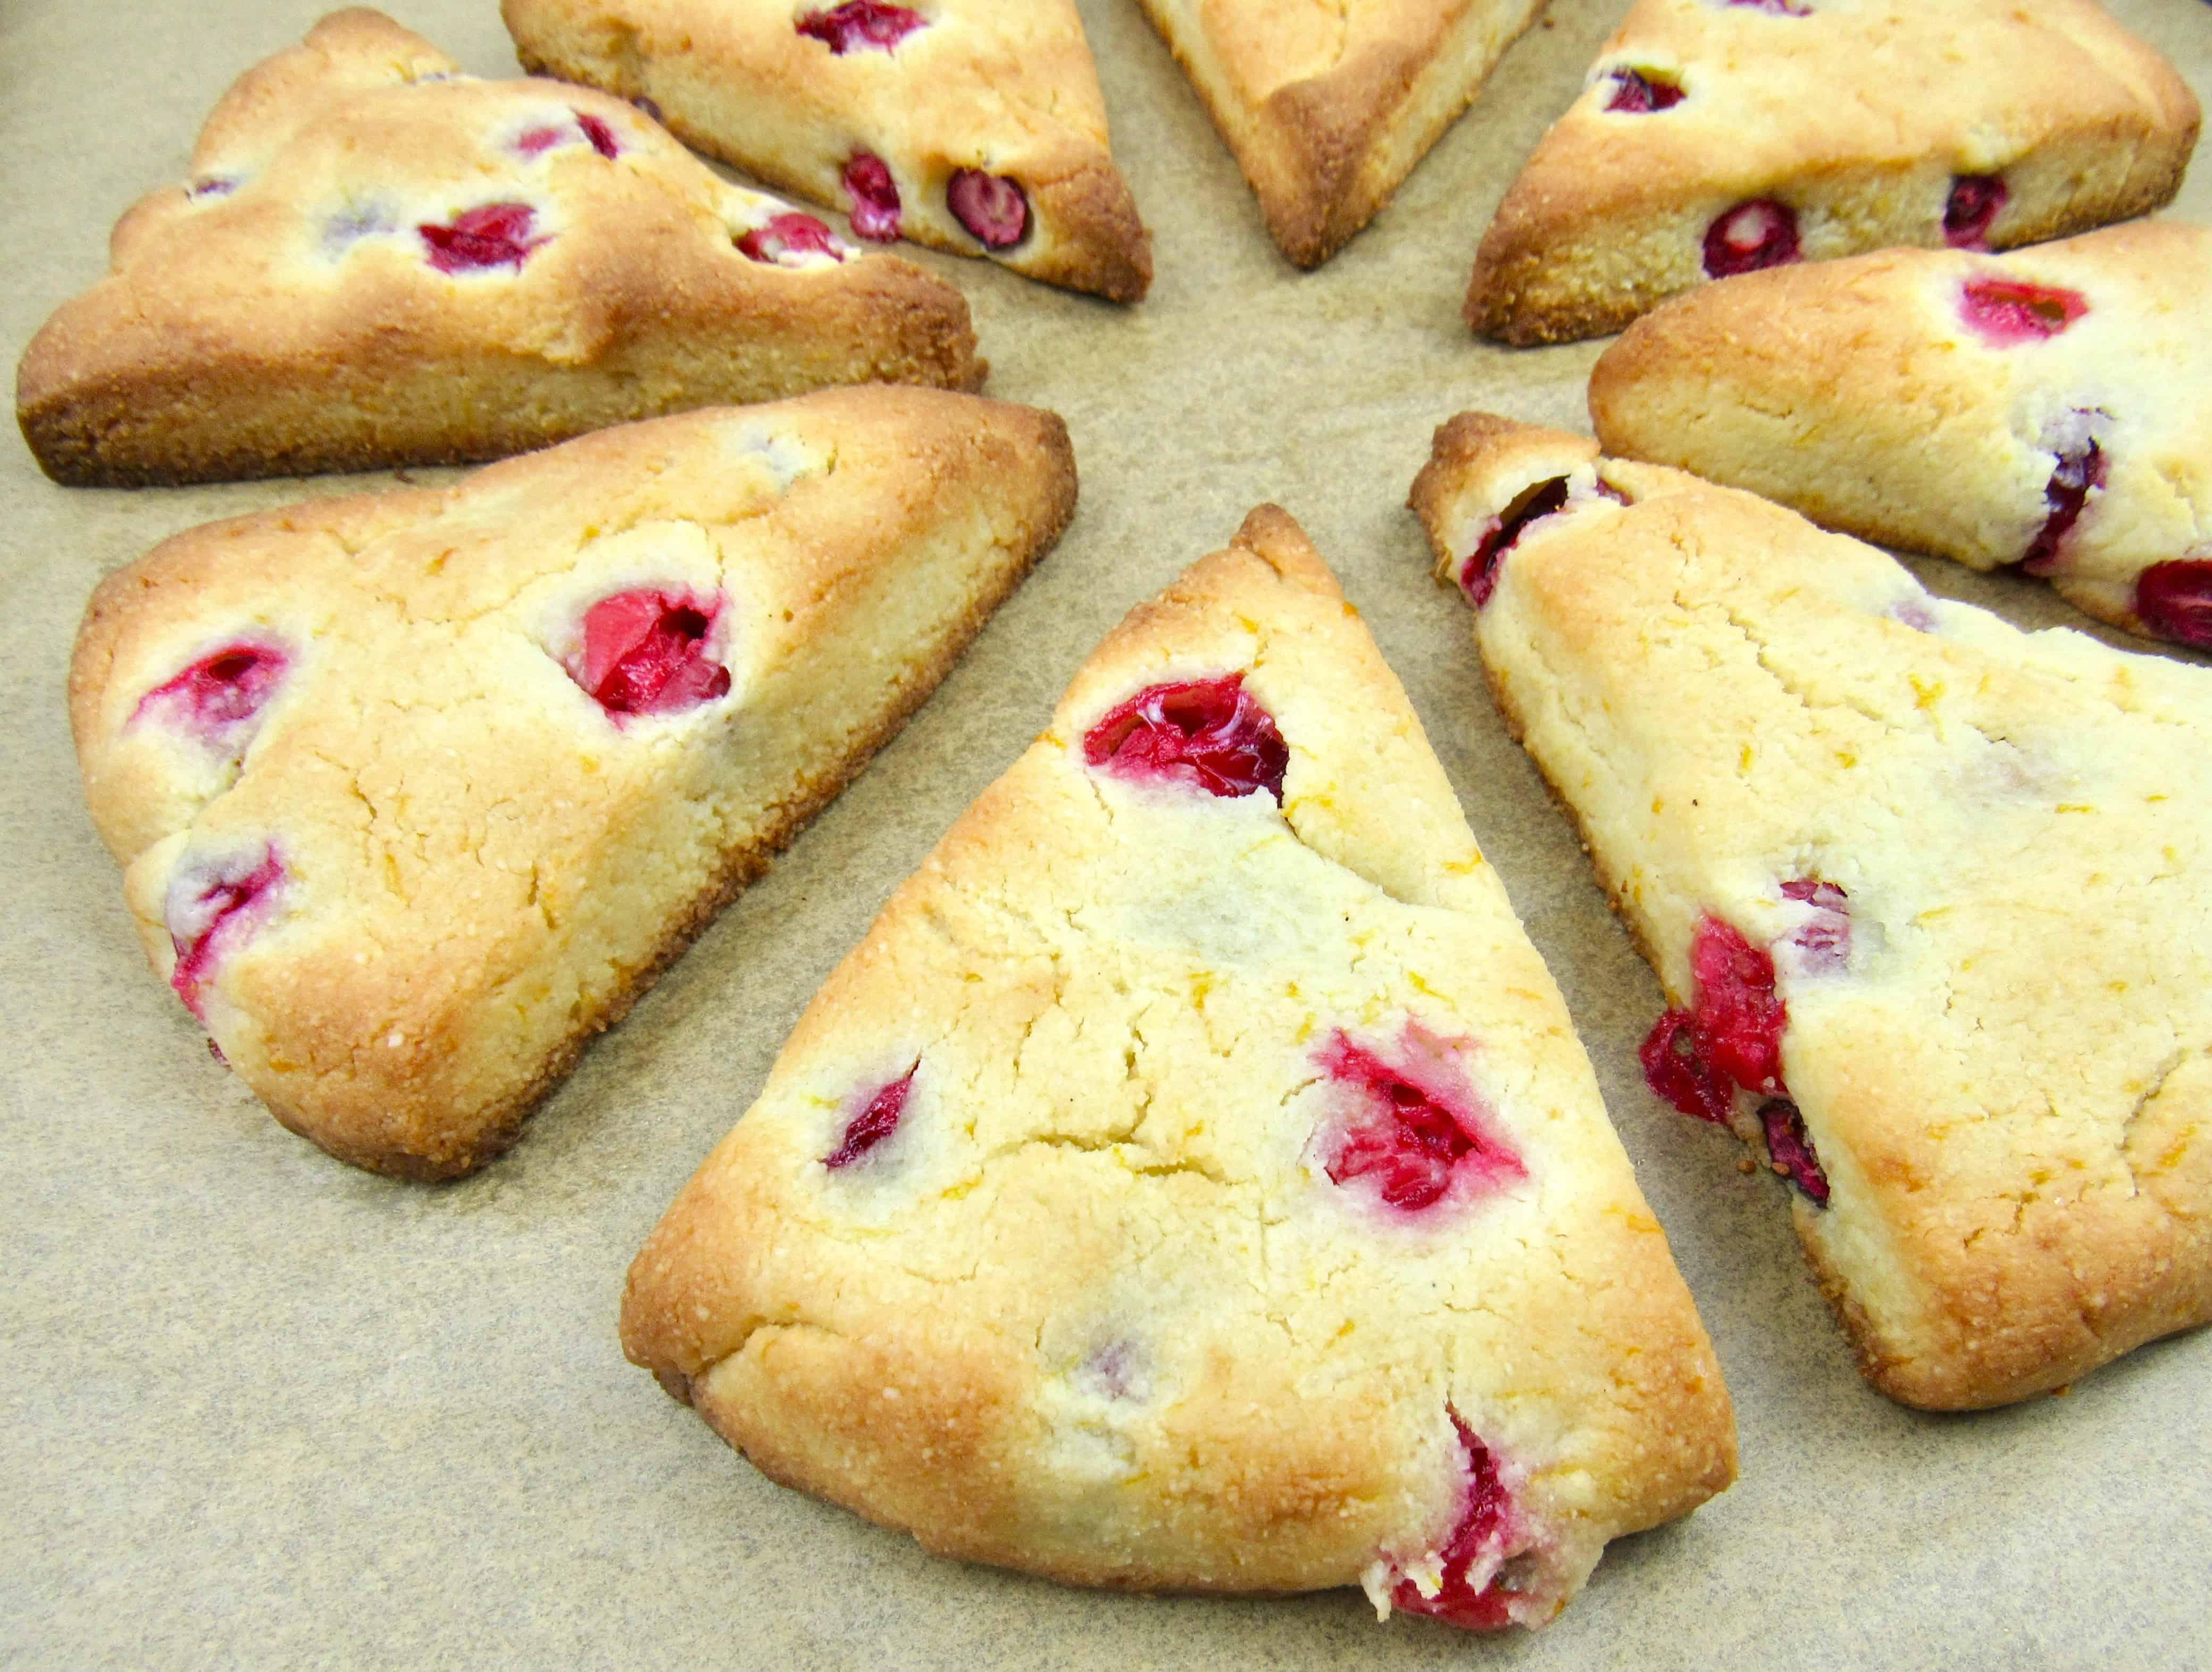 closeup of baked scones on sheet pan